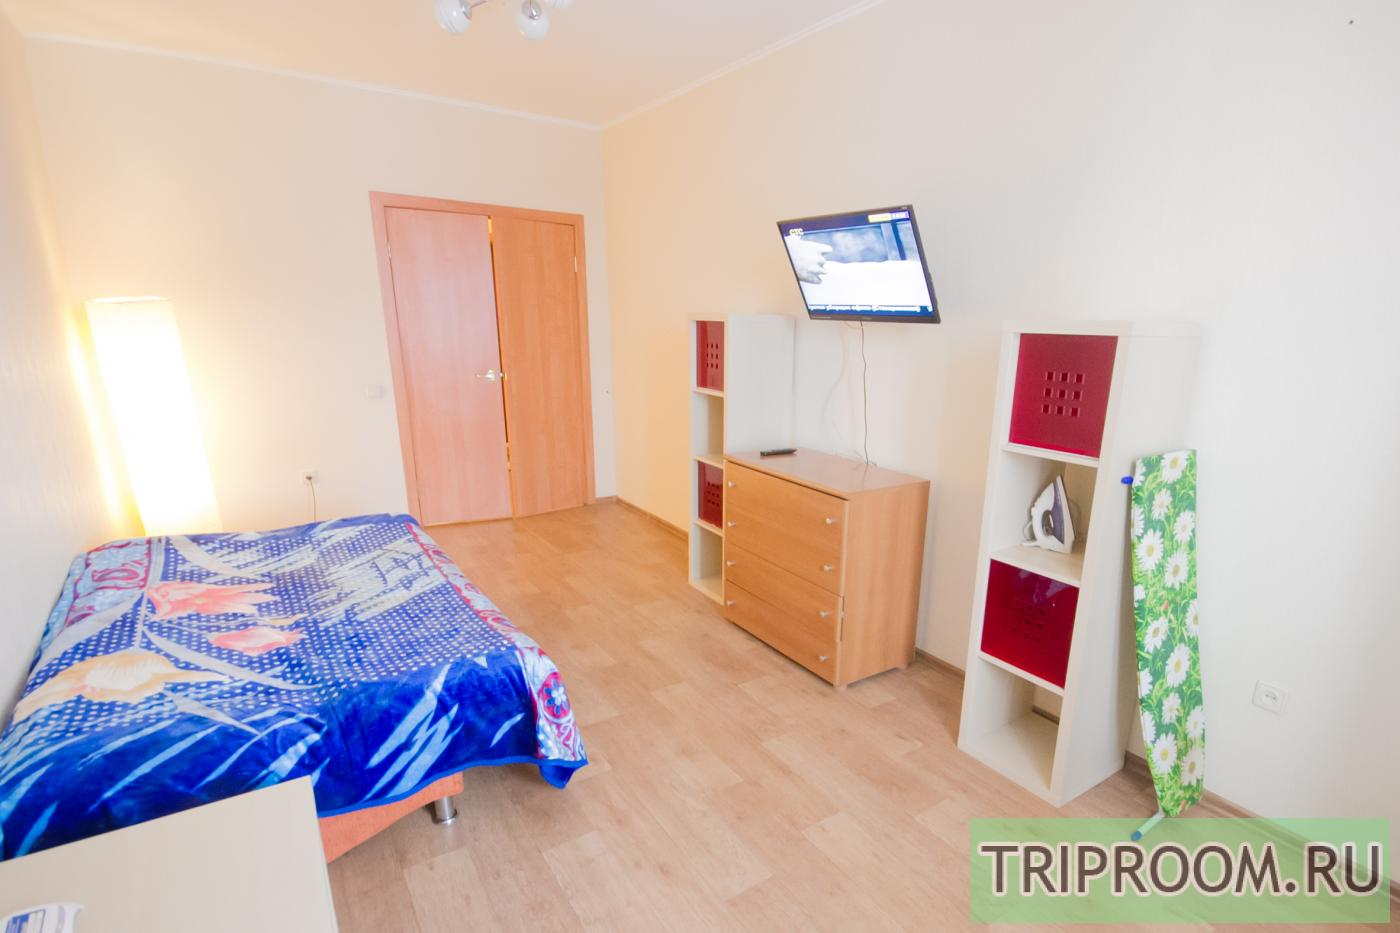 1-комнатная квартира посуточно (вариант № 9382), ул. Галущака улица, фото № 2